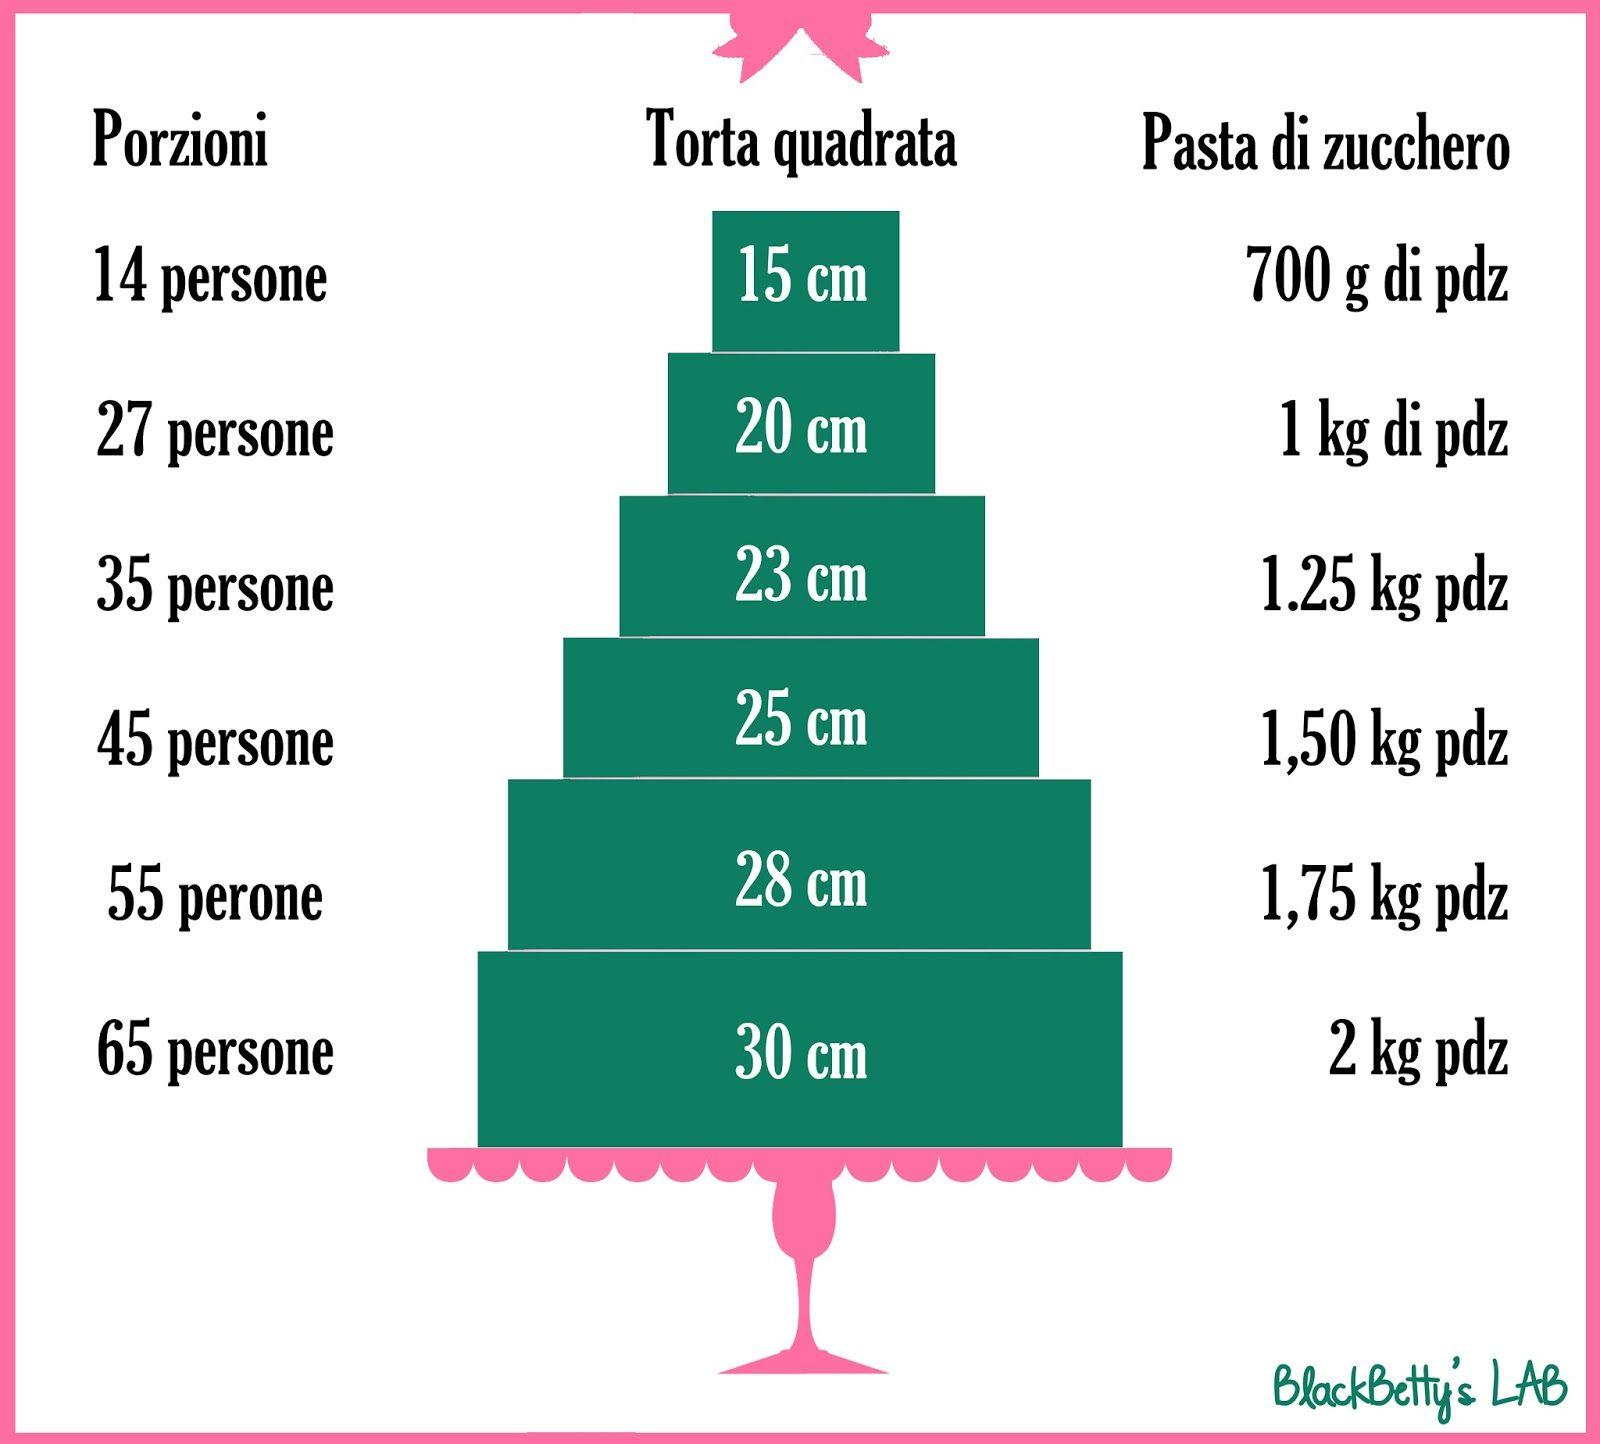 Dolci e cucina - Ricetta Pasta di zucchero